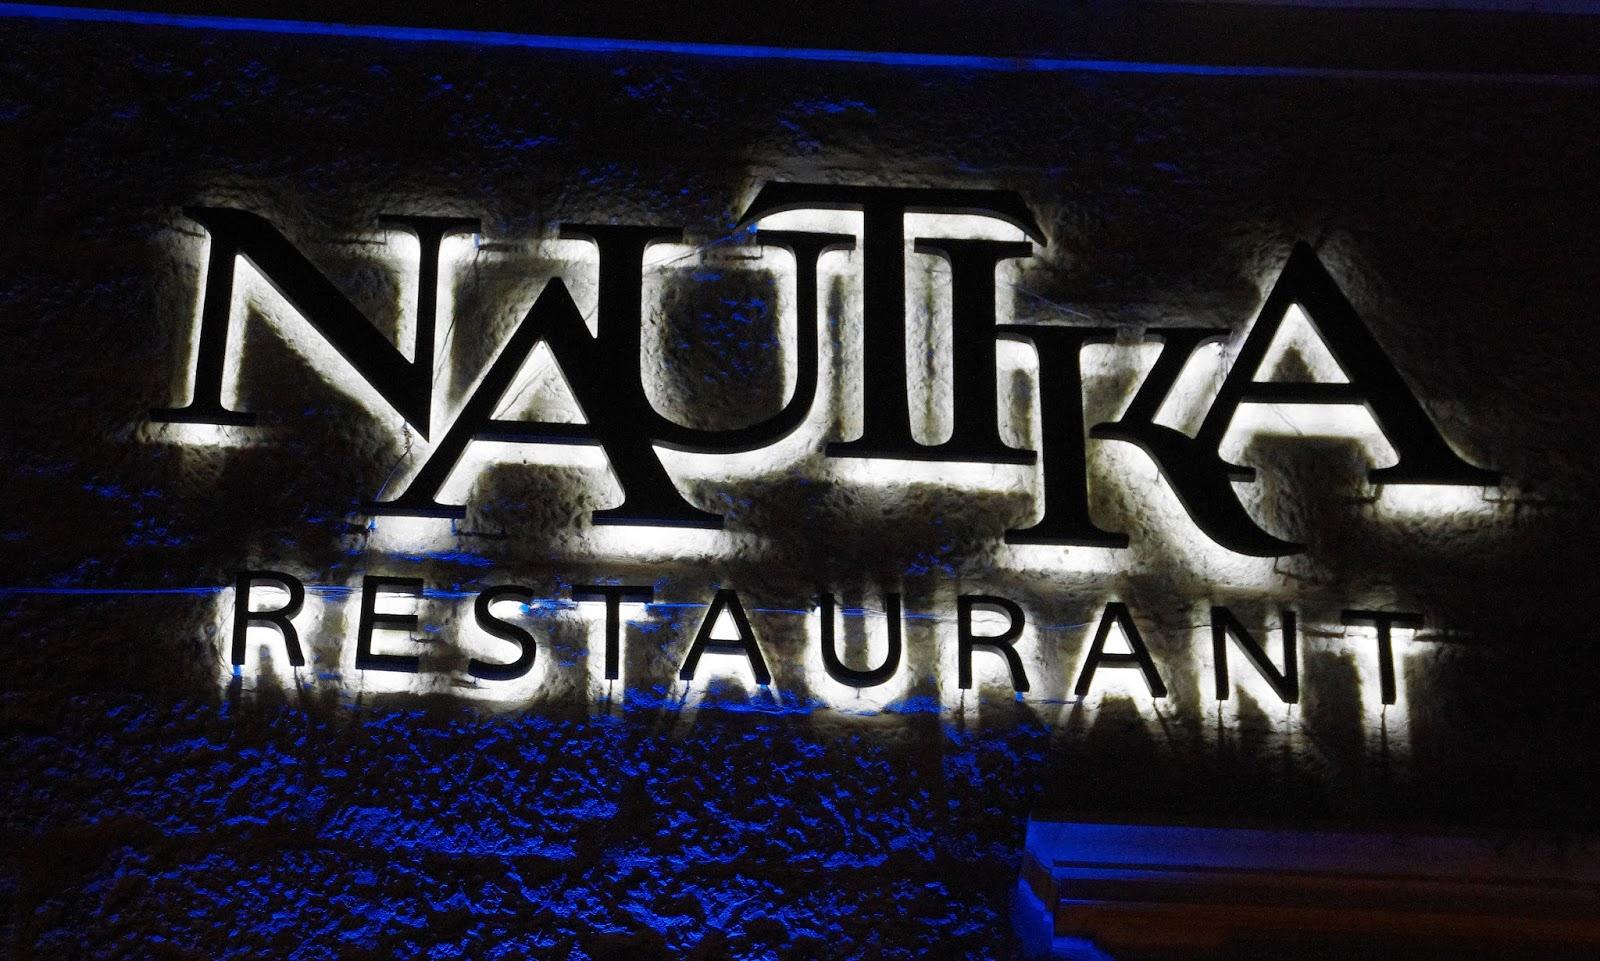 Nautika Restaurant Sign lit up at night